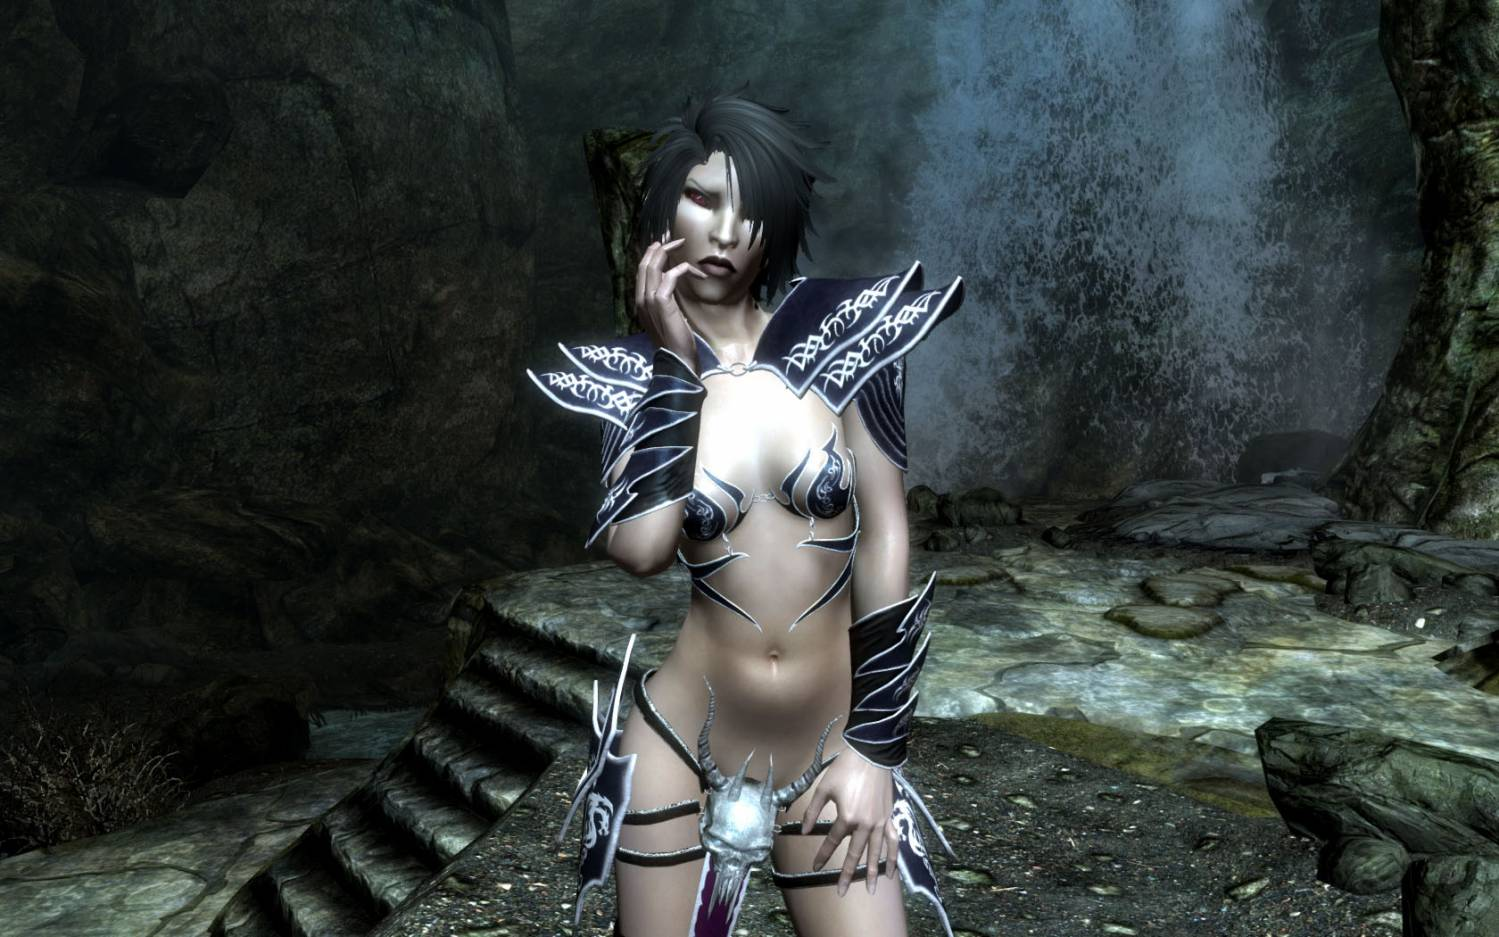 Warhammer online nude mod porn pic